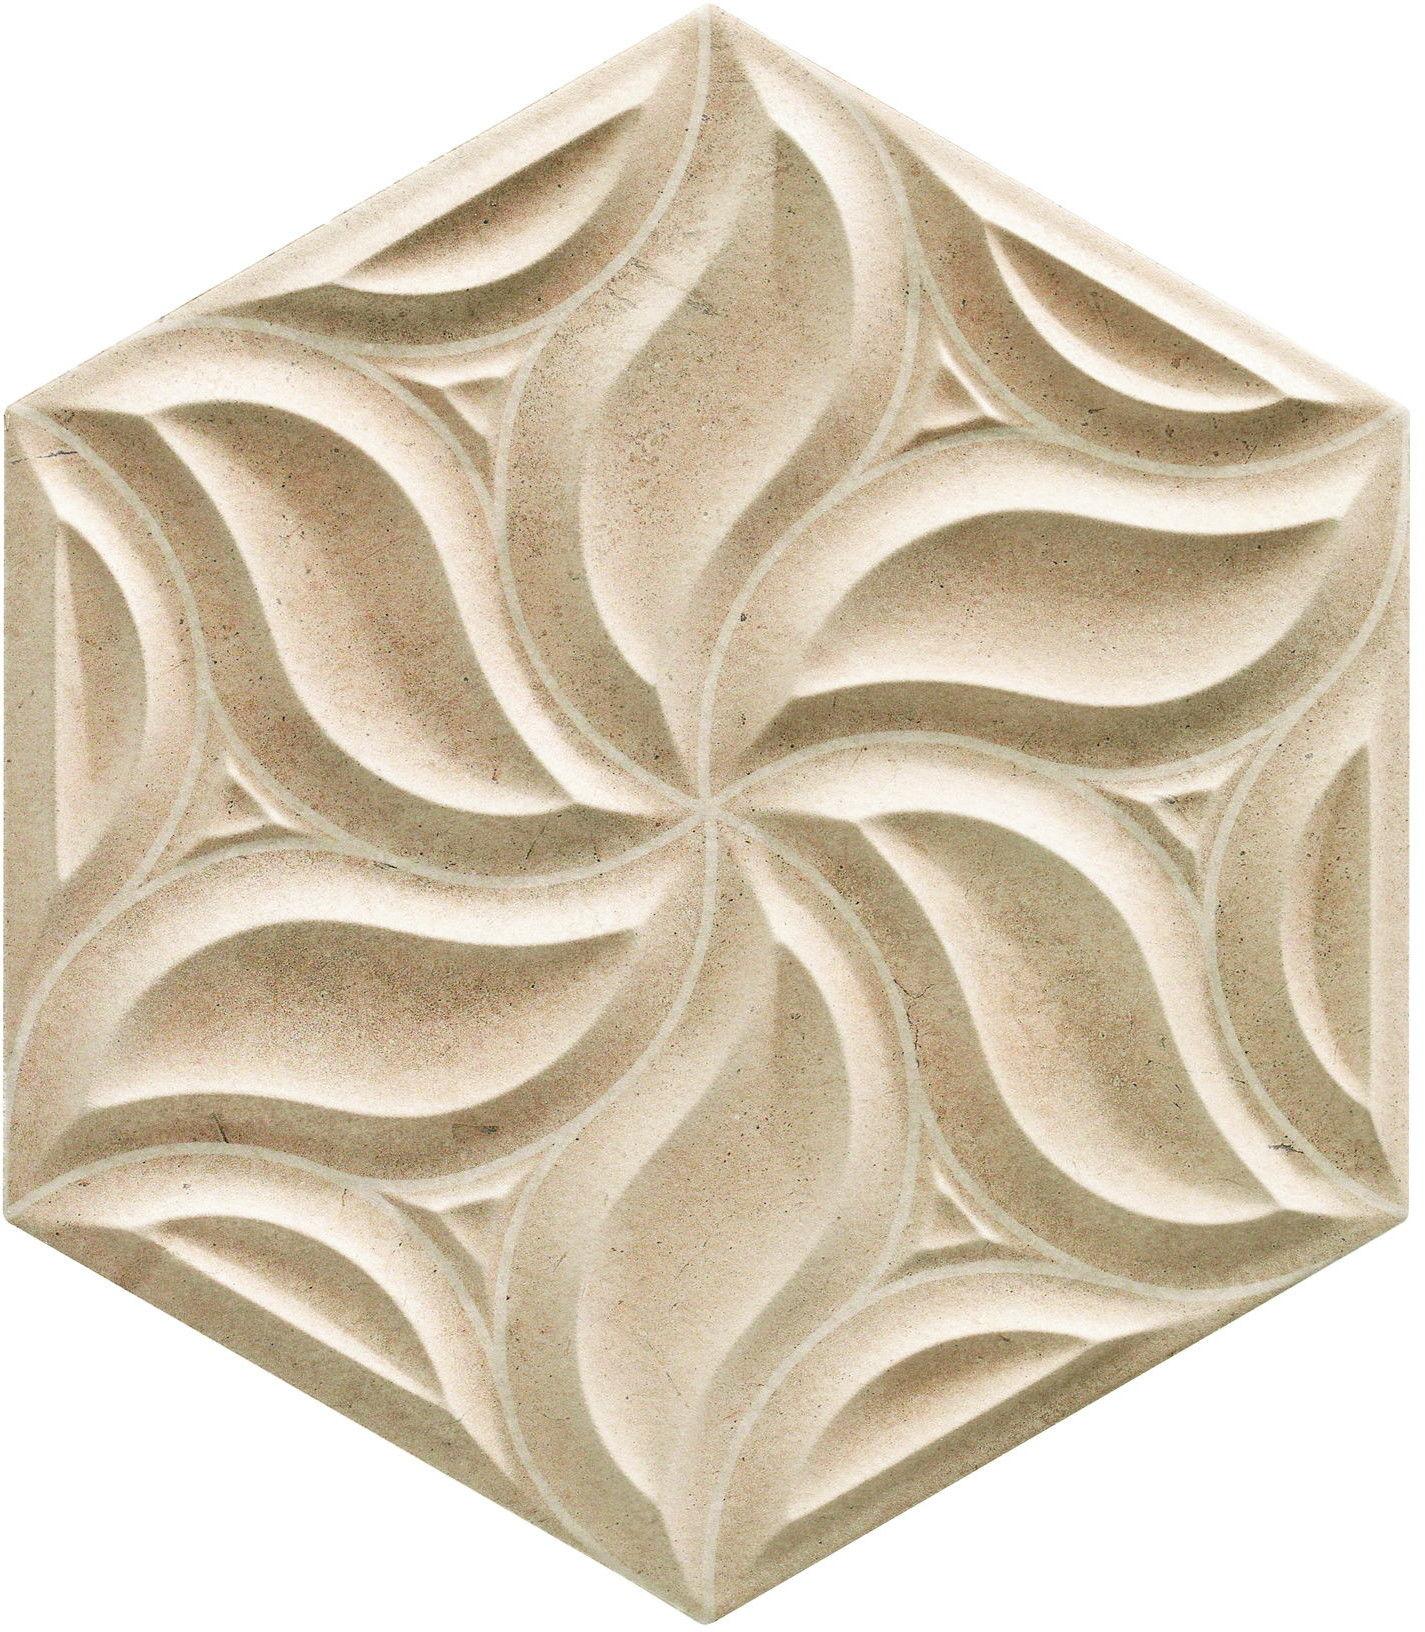 Habitat Ivy Greige 28,5x33 płytka ścienna heksagonalna